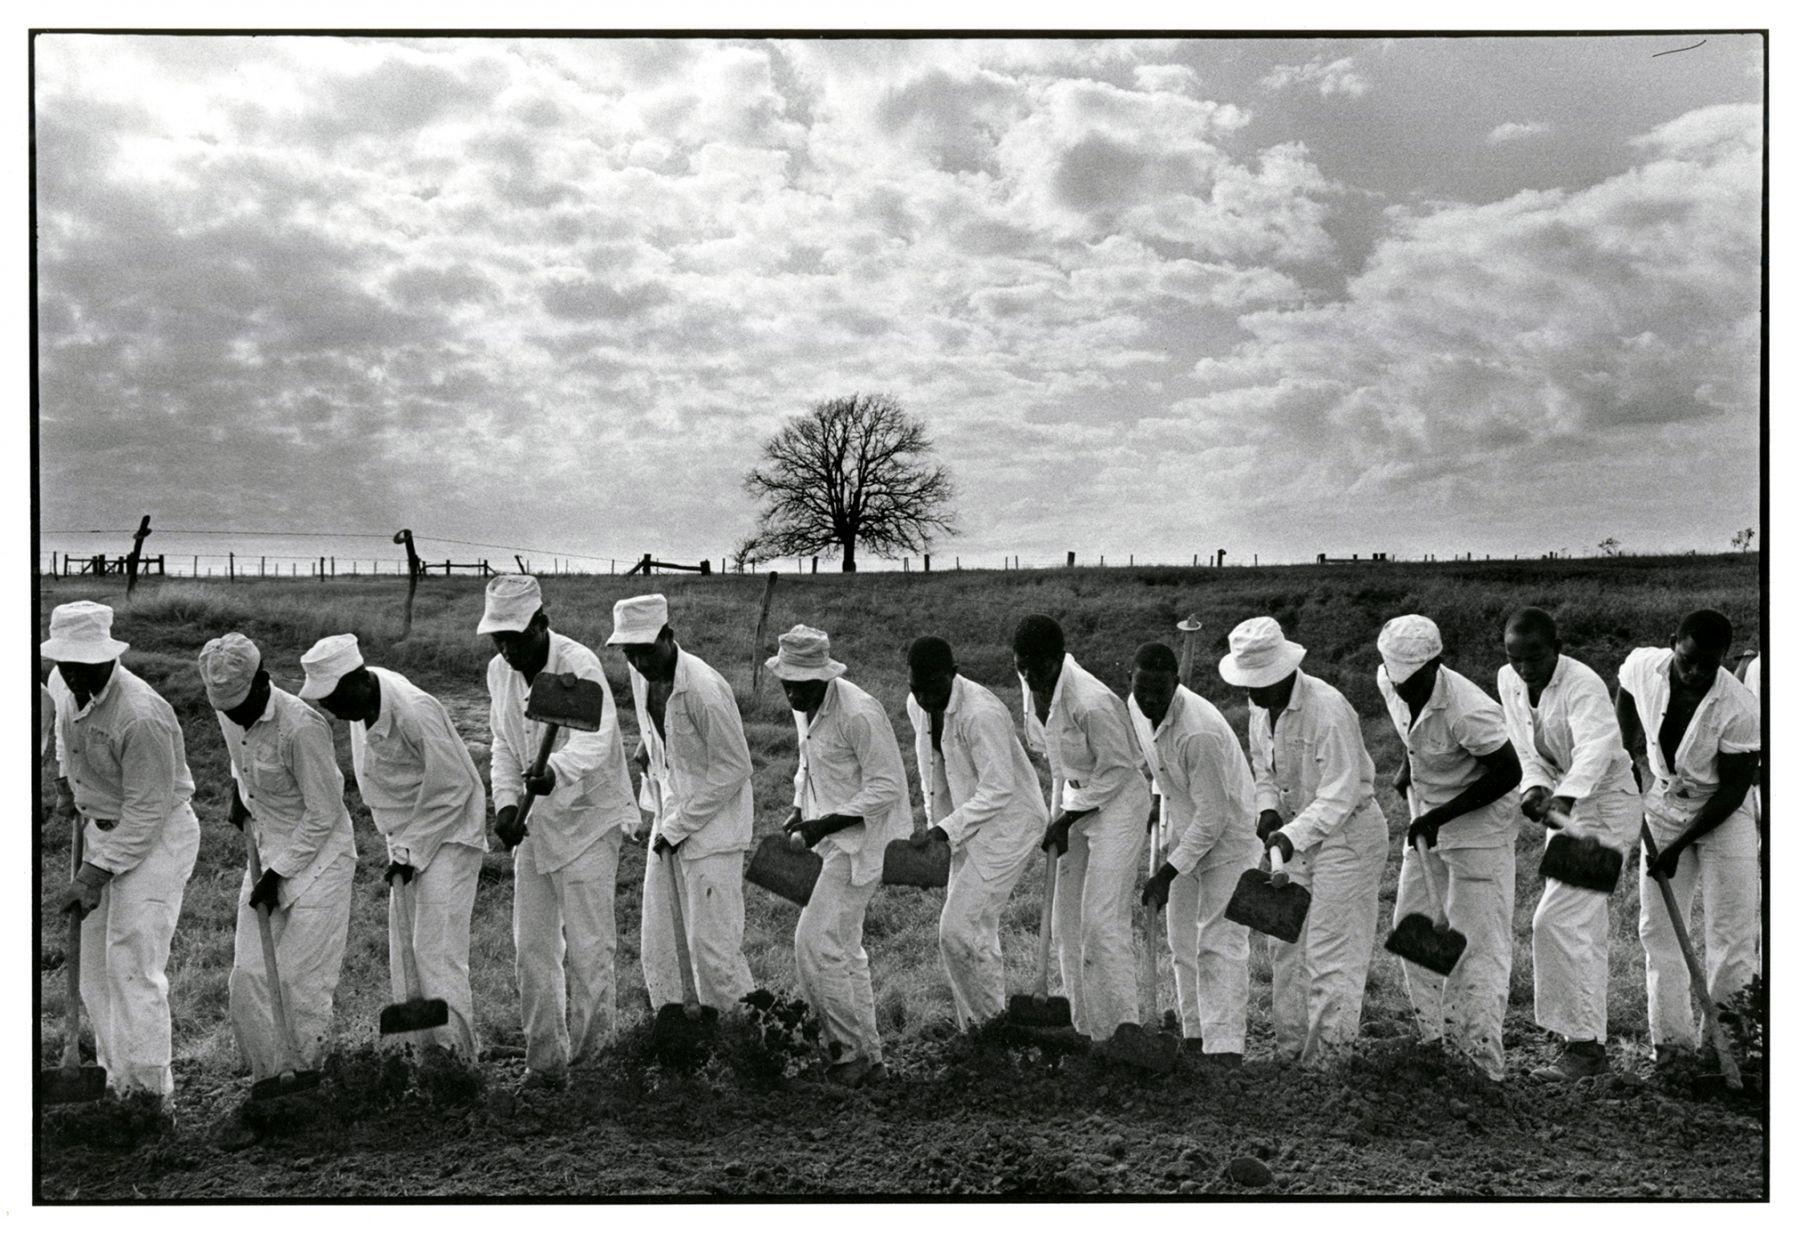 Copyright Danny Lyon / Magnum Photos, The Line, Gerguson Prison Farm, from Conversations with the Dead, 1968